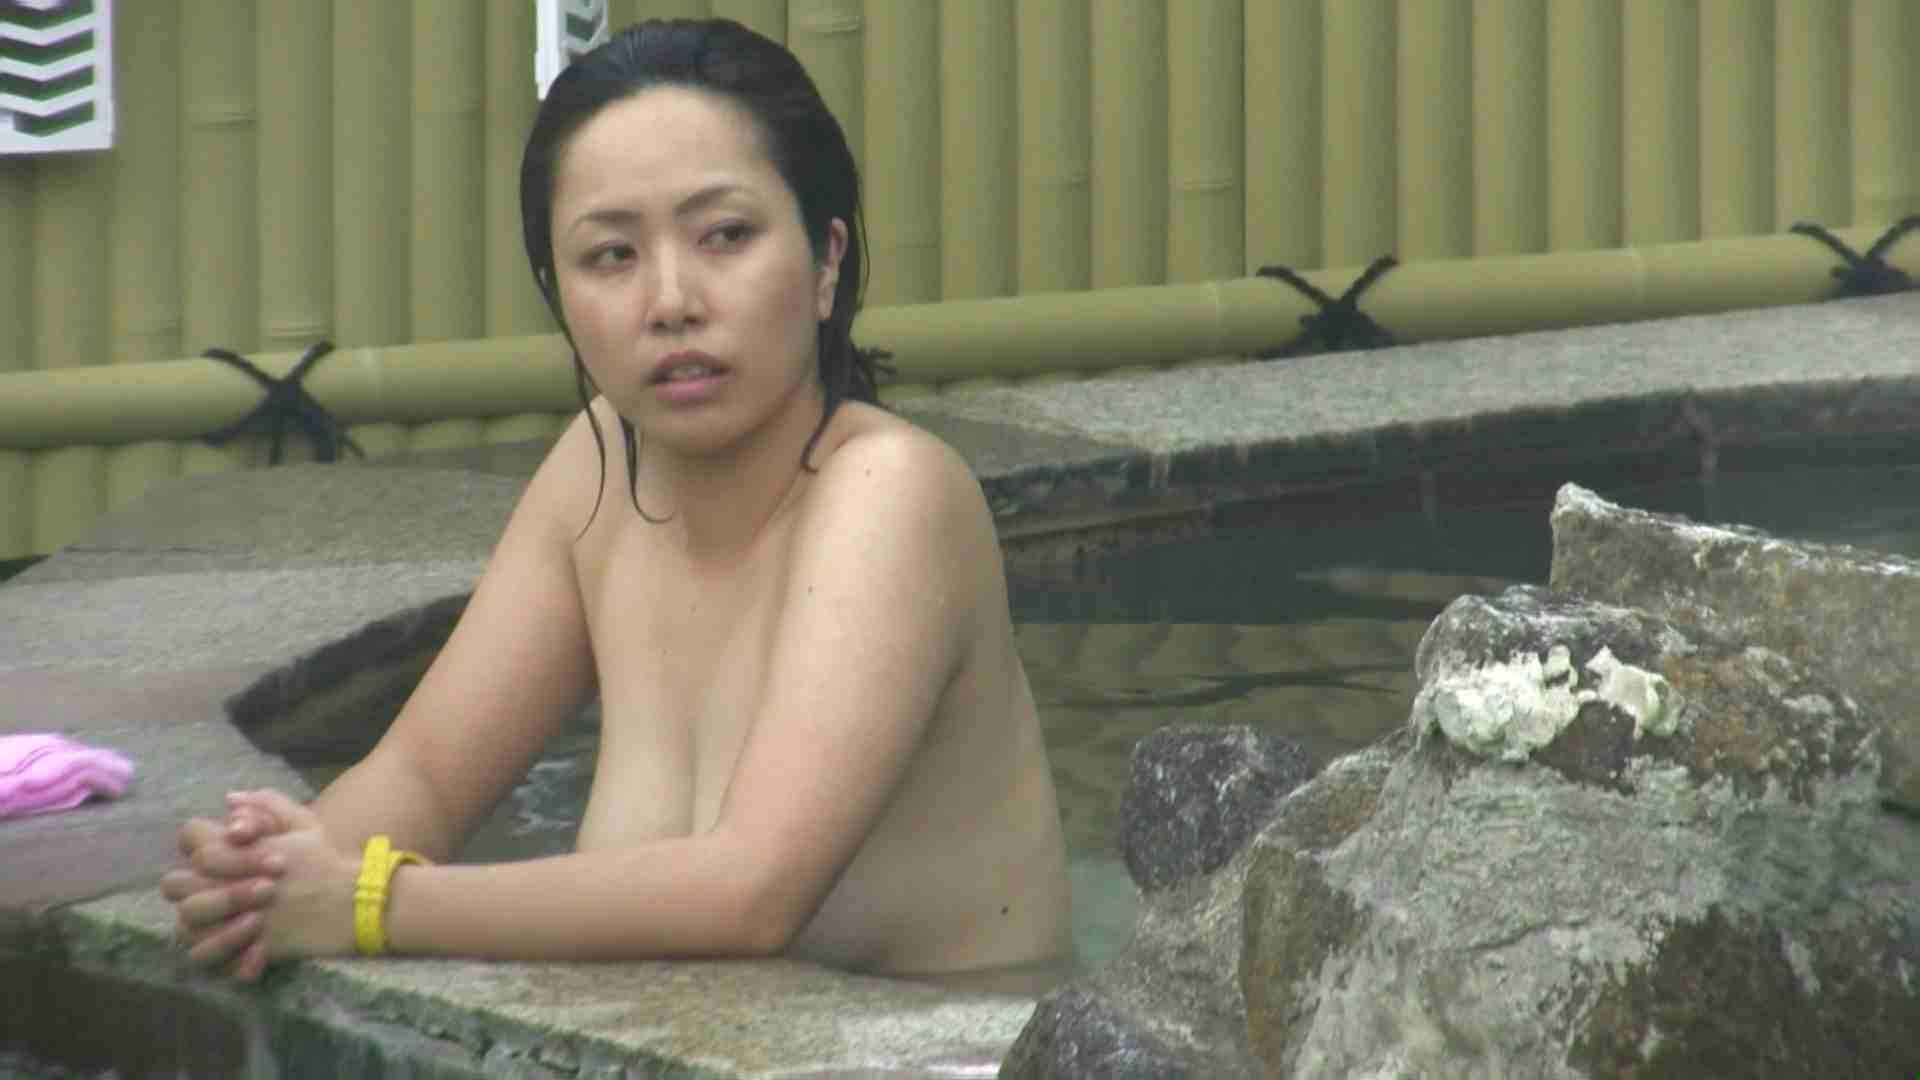 Aquaな露天風呂Vol.604 露天風呂編  89PIX 4